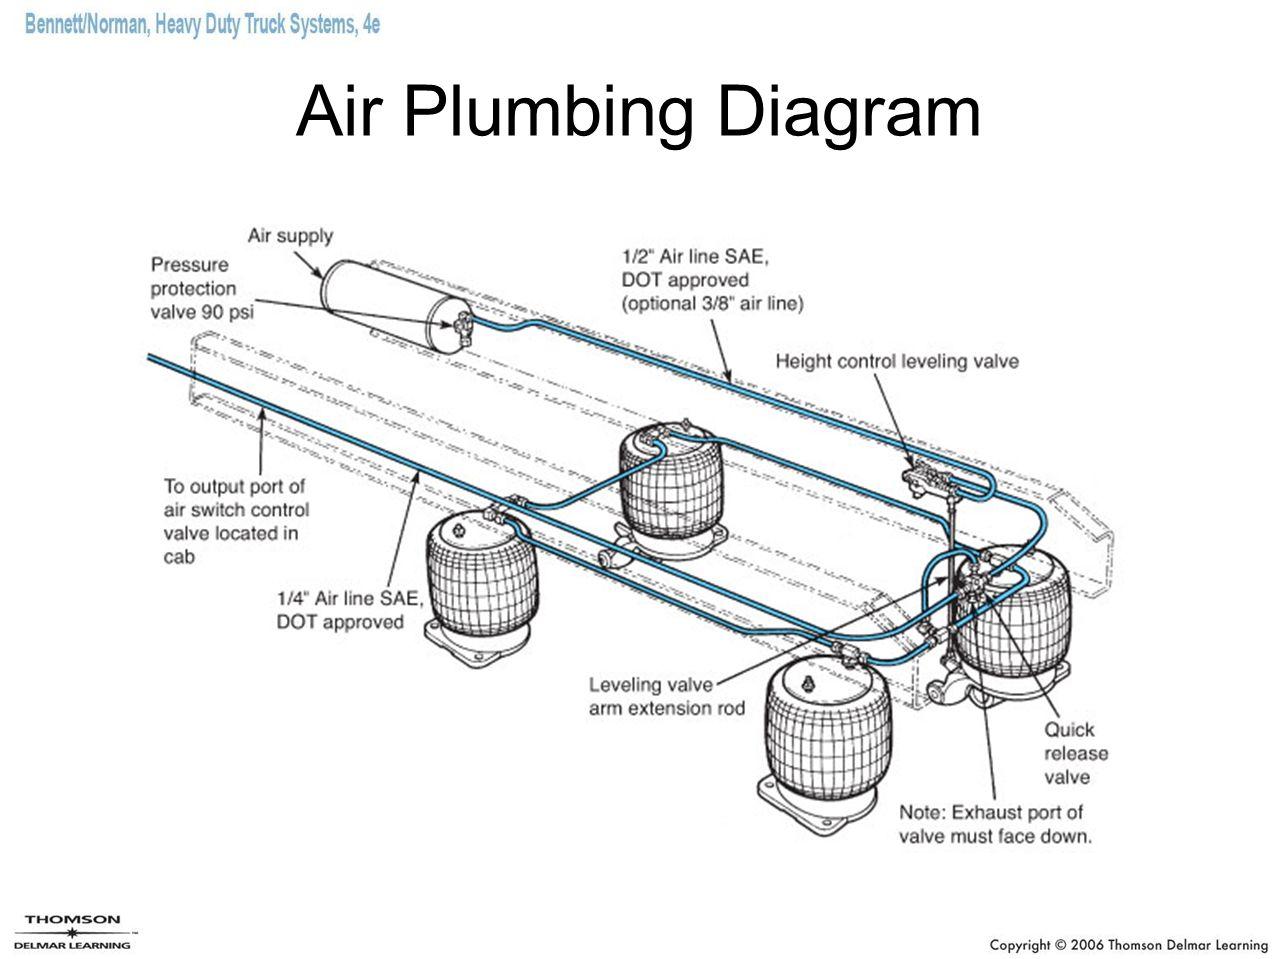 Semi Air Bag Schematic   Wiring Diagram Air Bag Pressor Wiring Diagram on